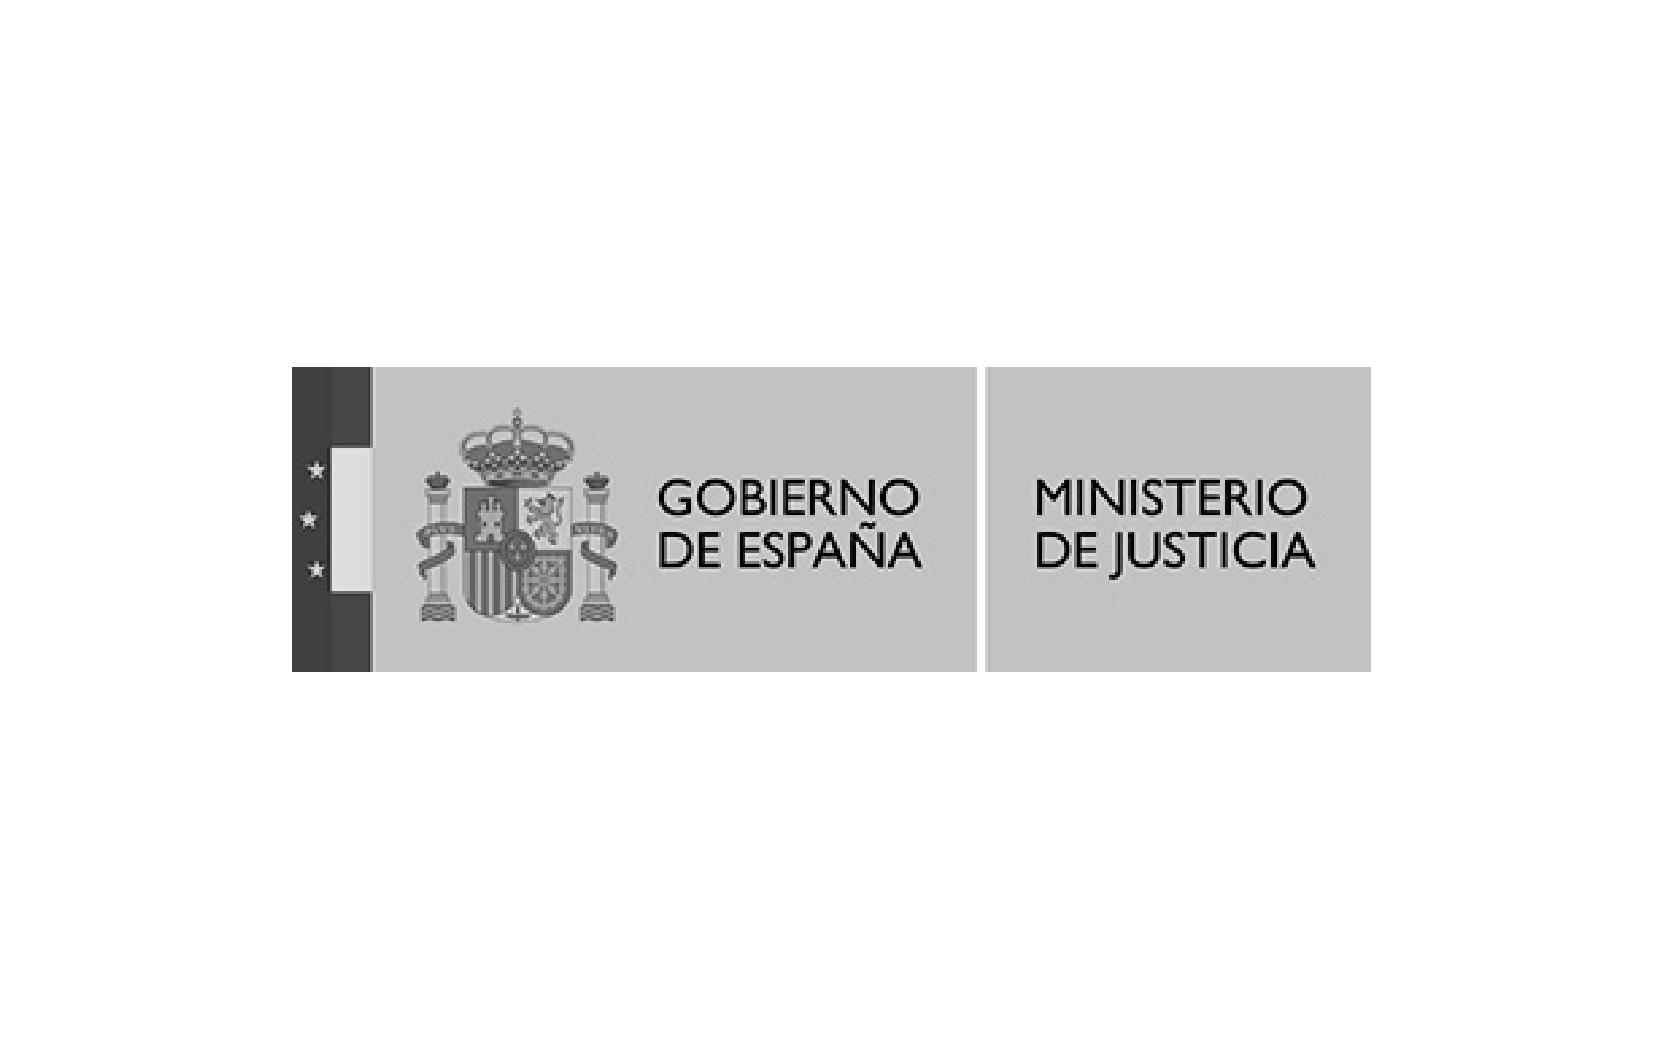 logo-ministerio-de-justicia